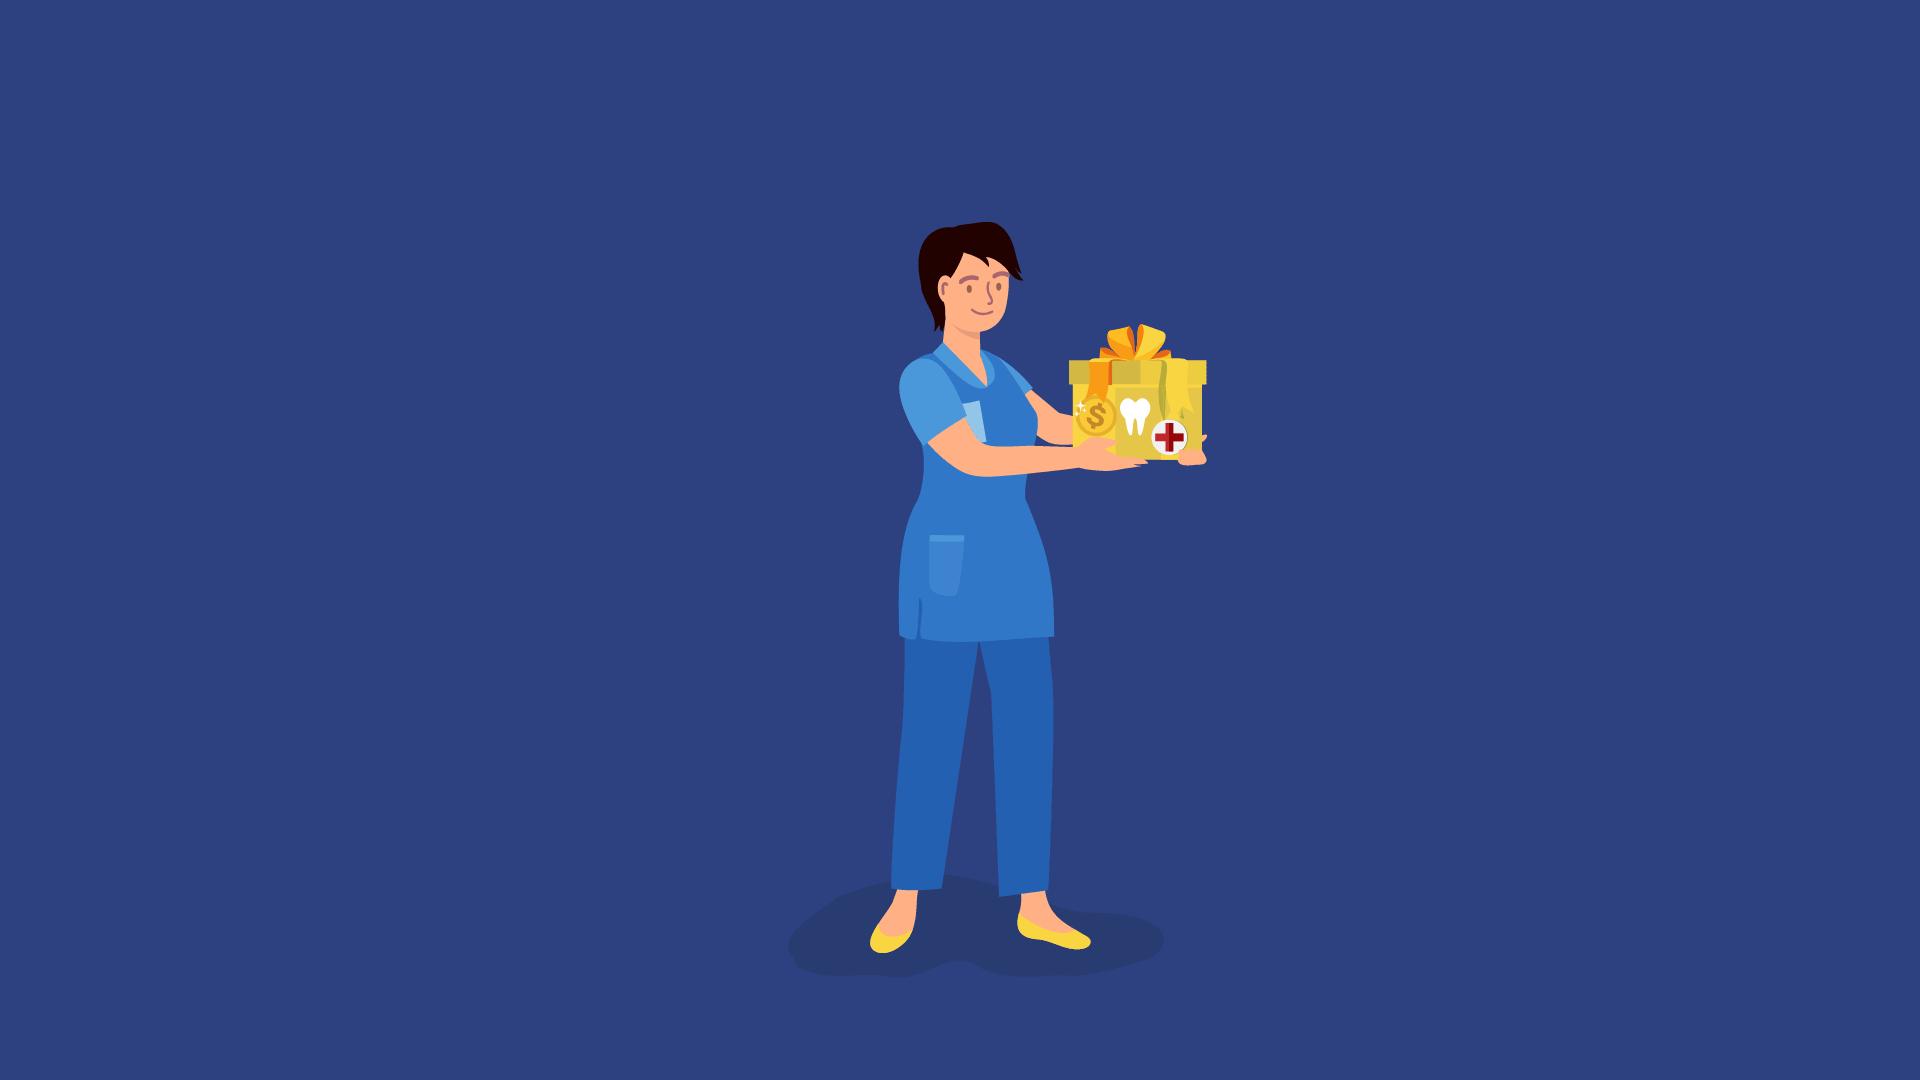 cartoon nurse holding a gift